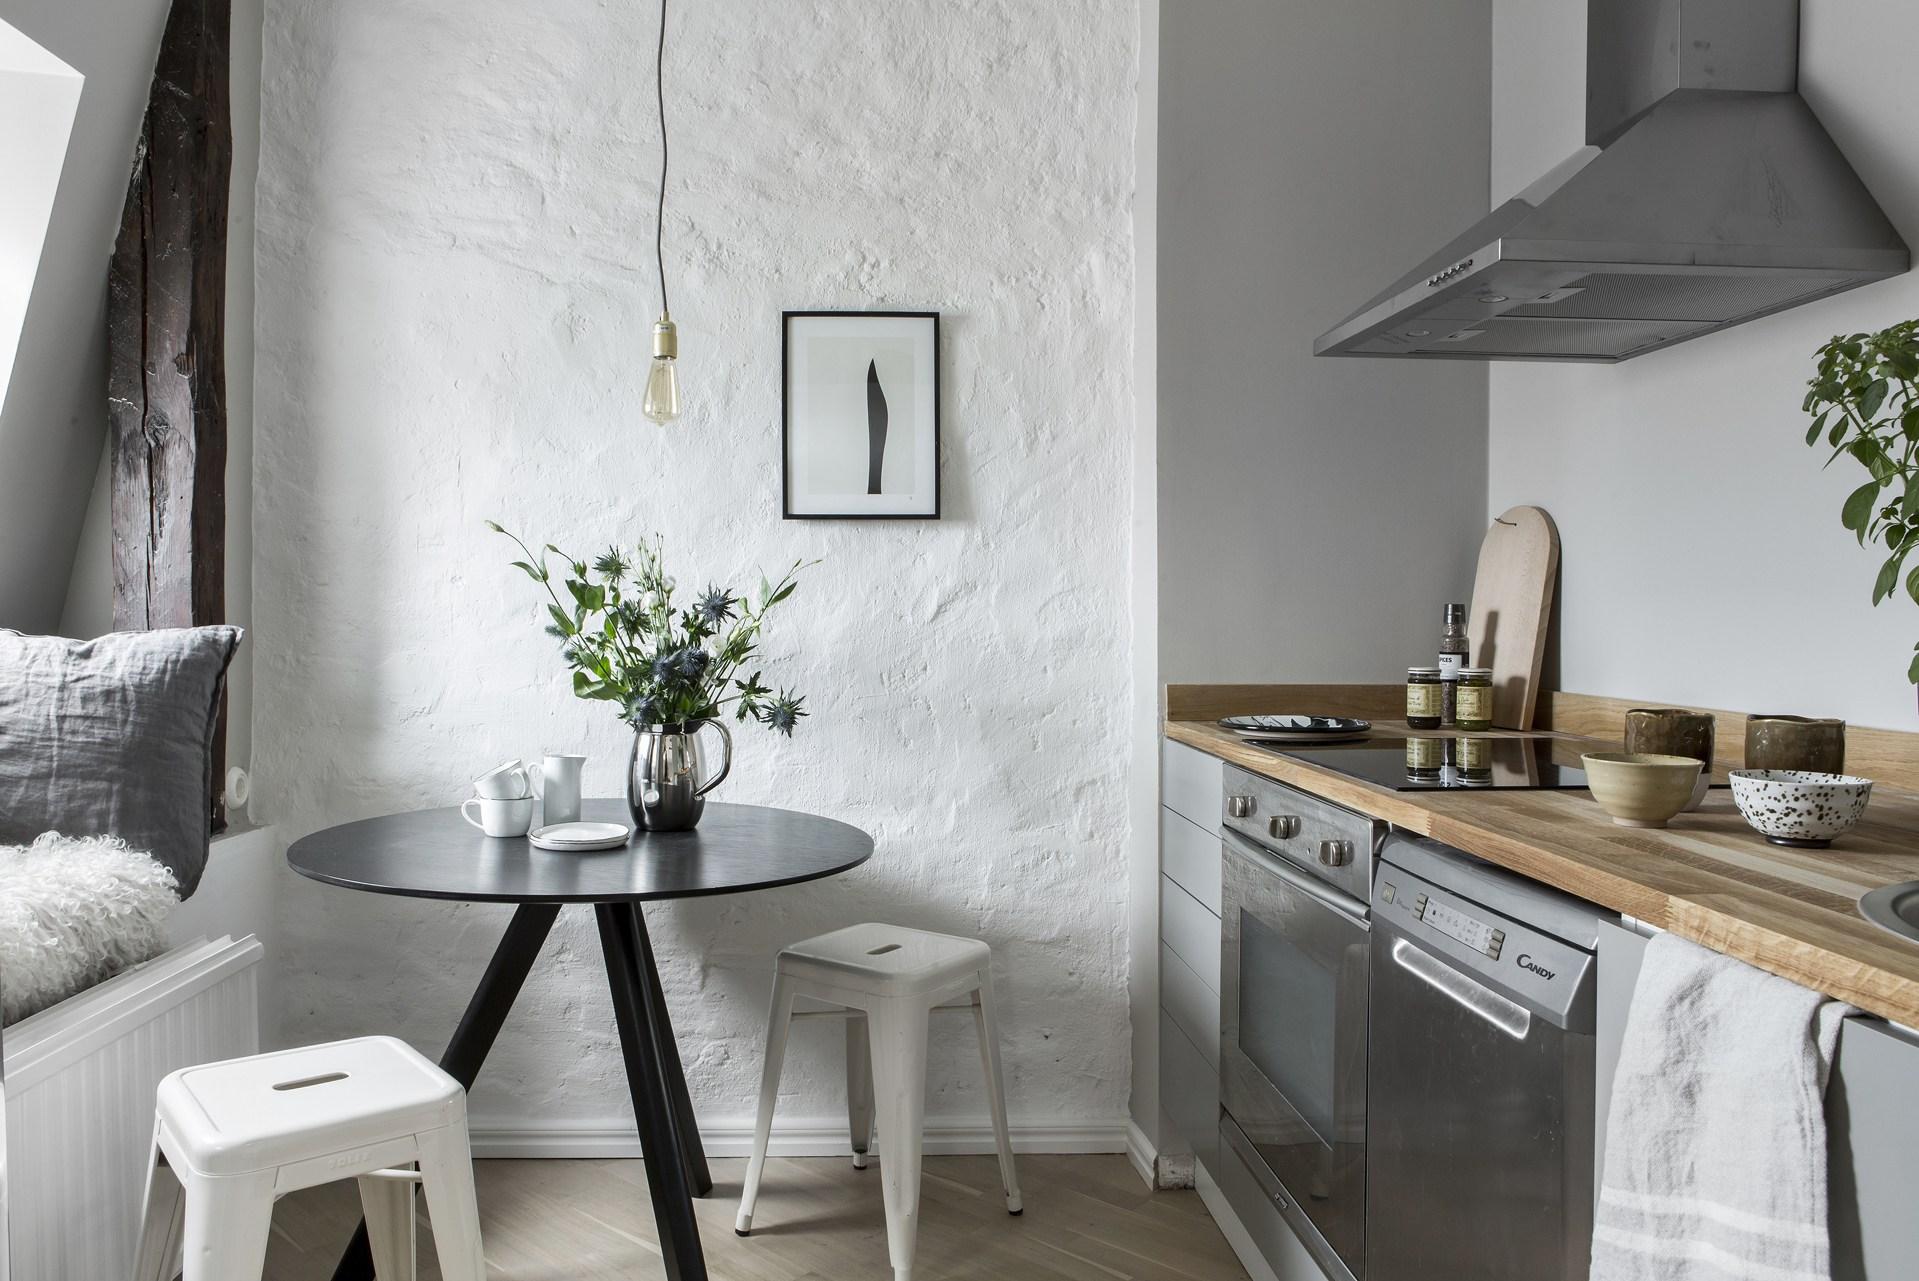 ROSE & IVY Journal Inspiring Interiors Undone Walls